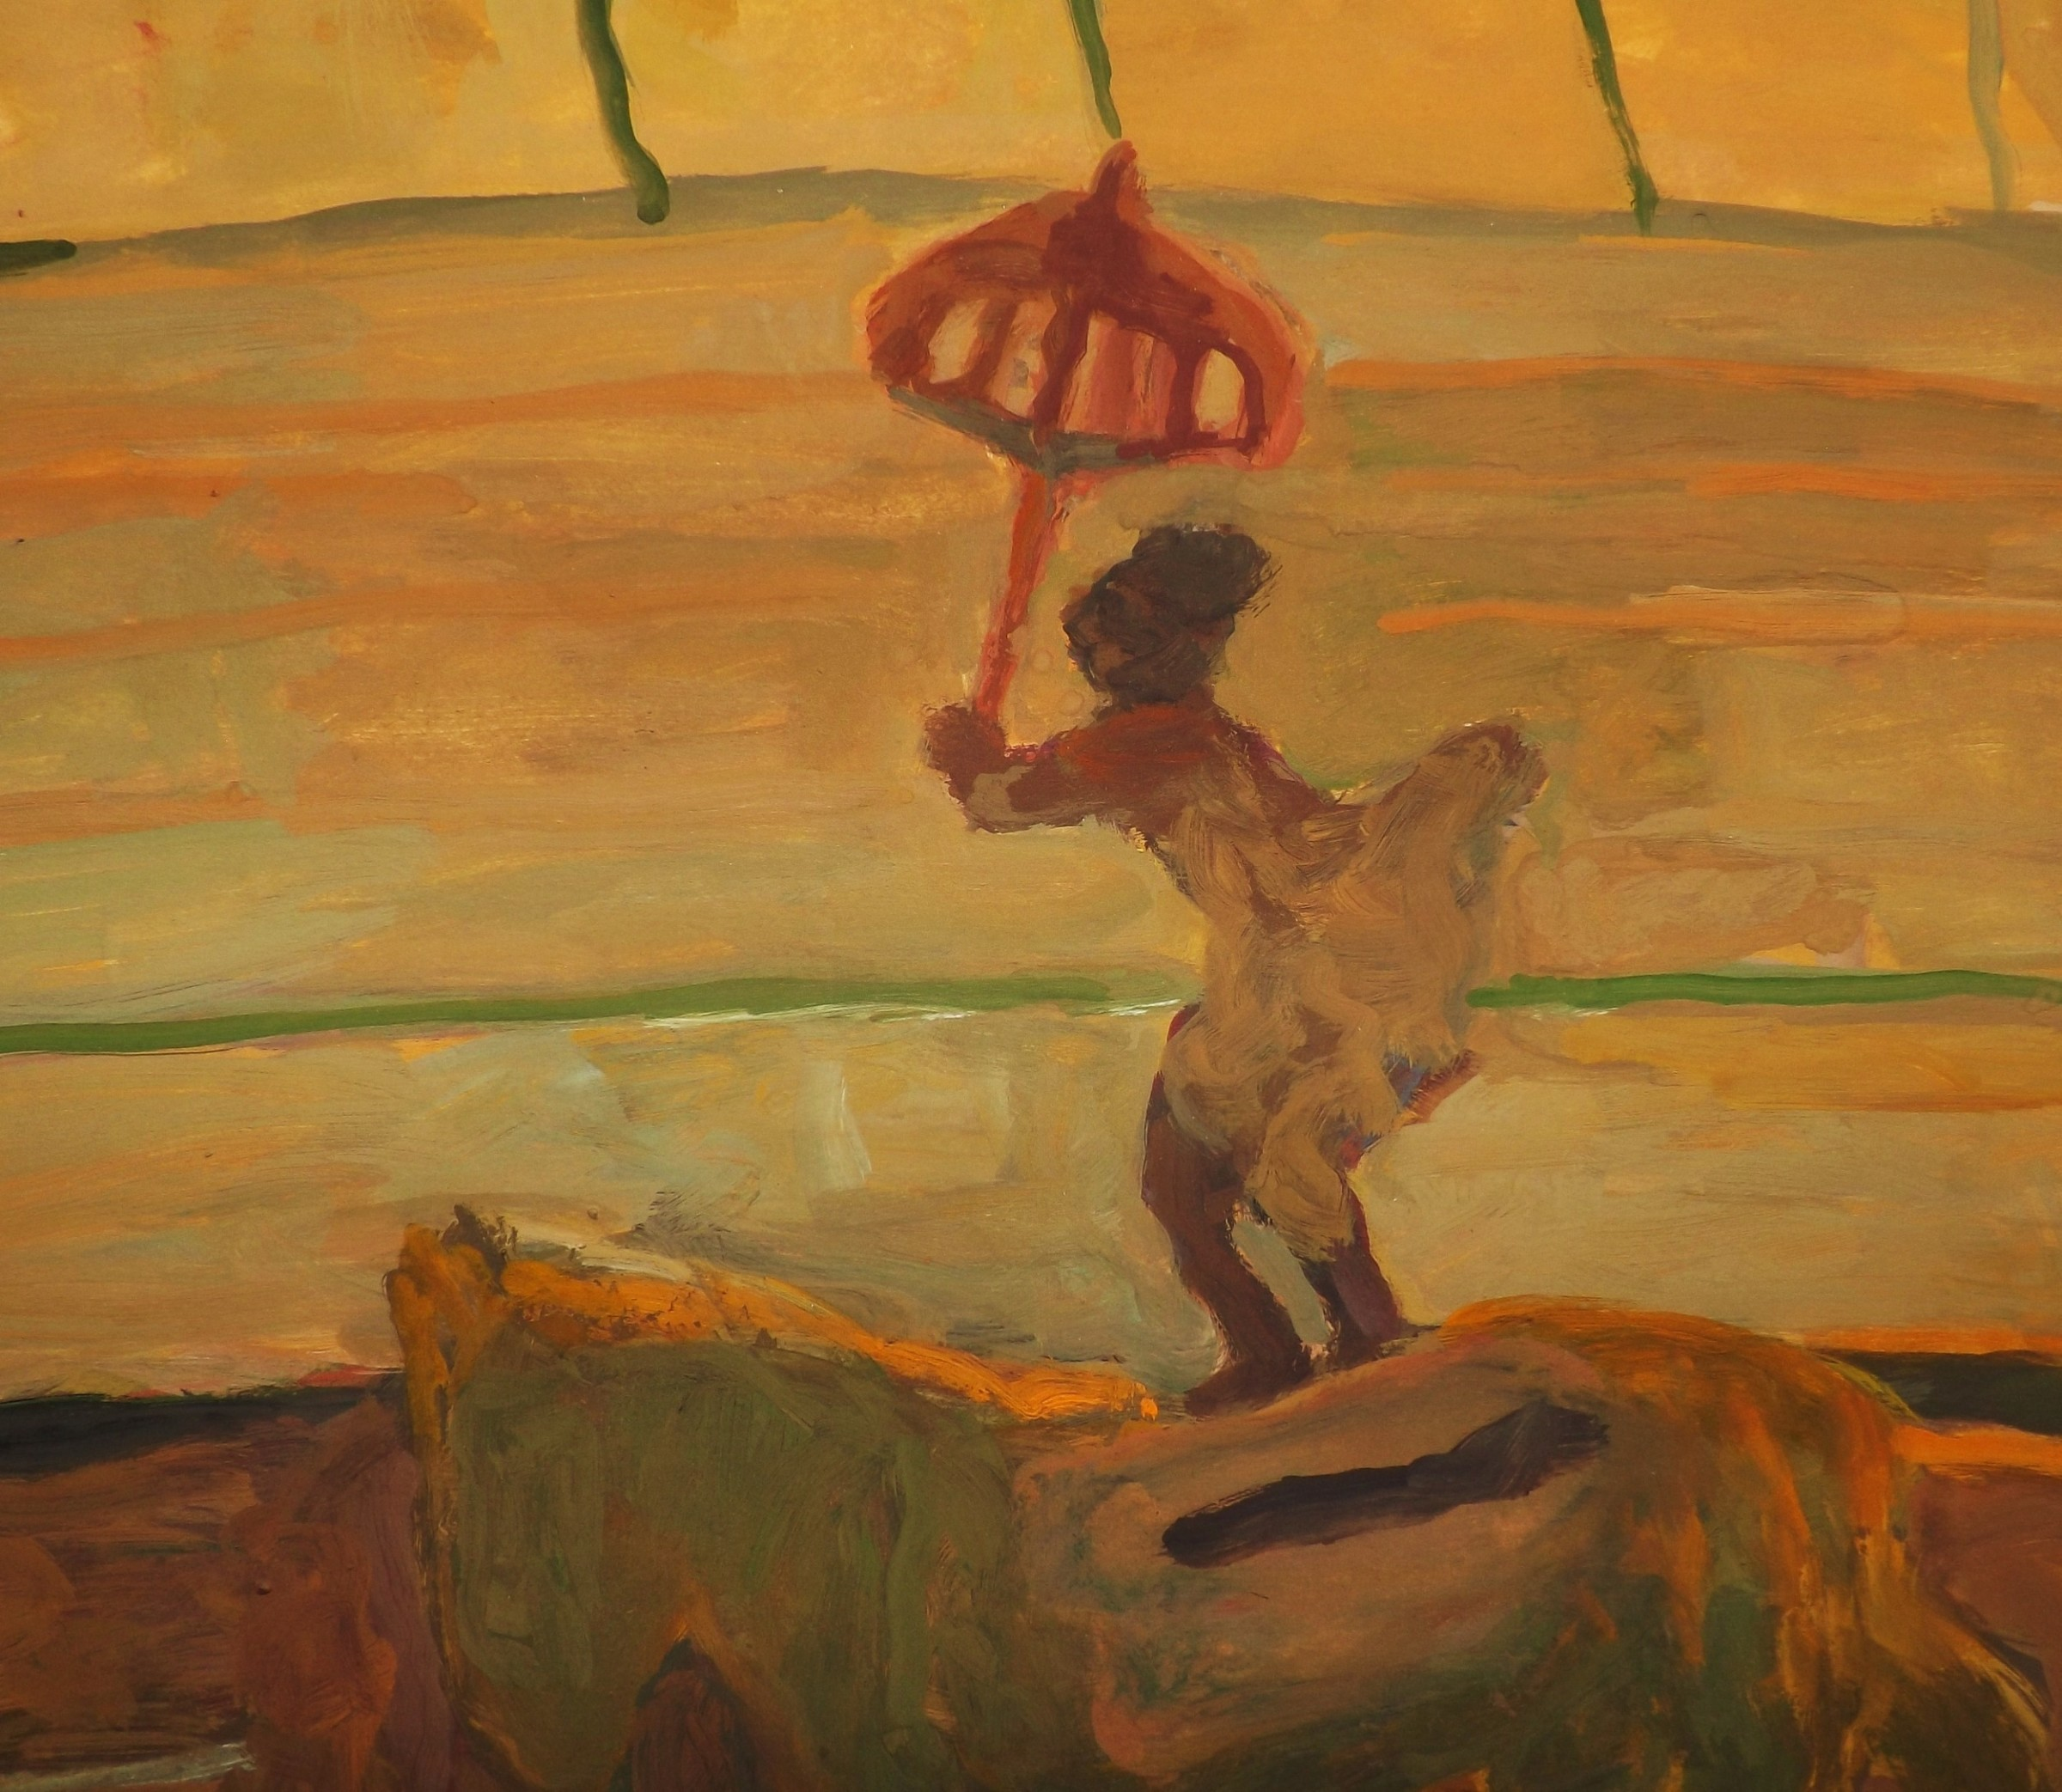 <span class=&#34;link fancybox-details-link&#34;><a href=&#34;/exhibitions/24/works/artworks_standalone10755/&#34;>View Detail Page</a></span><div class=&#34;artist&#34;><span class=&#34;artist&#34;><strong>Bridget Moore</strong></span></div><div class=&#34;title&#34;><em>Red Brolly</em></div><div class=&#34;medium&#34;>gouache</div><div class=&#34;dimensions&#34;>39x33cm</div>